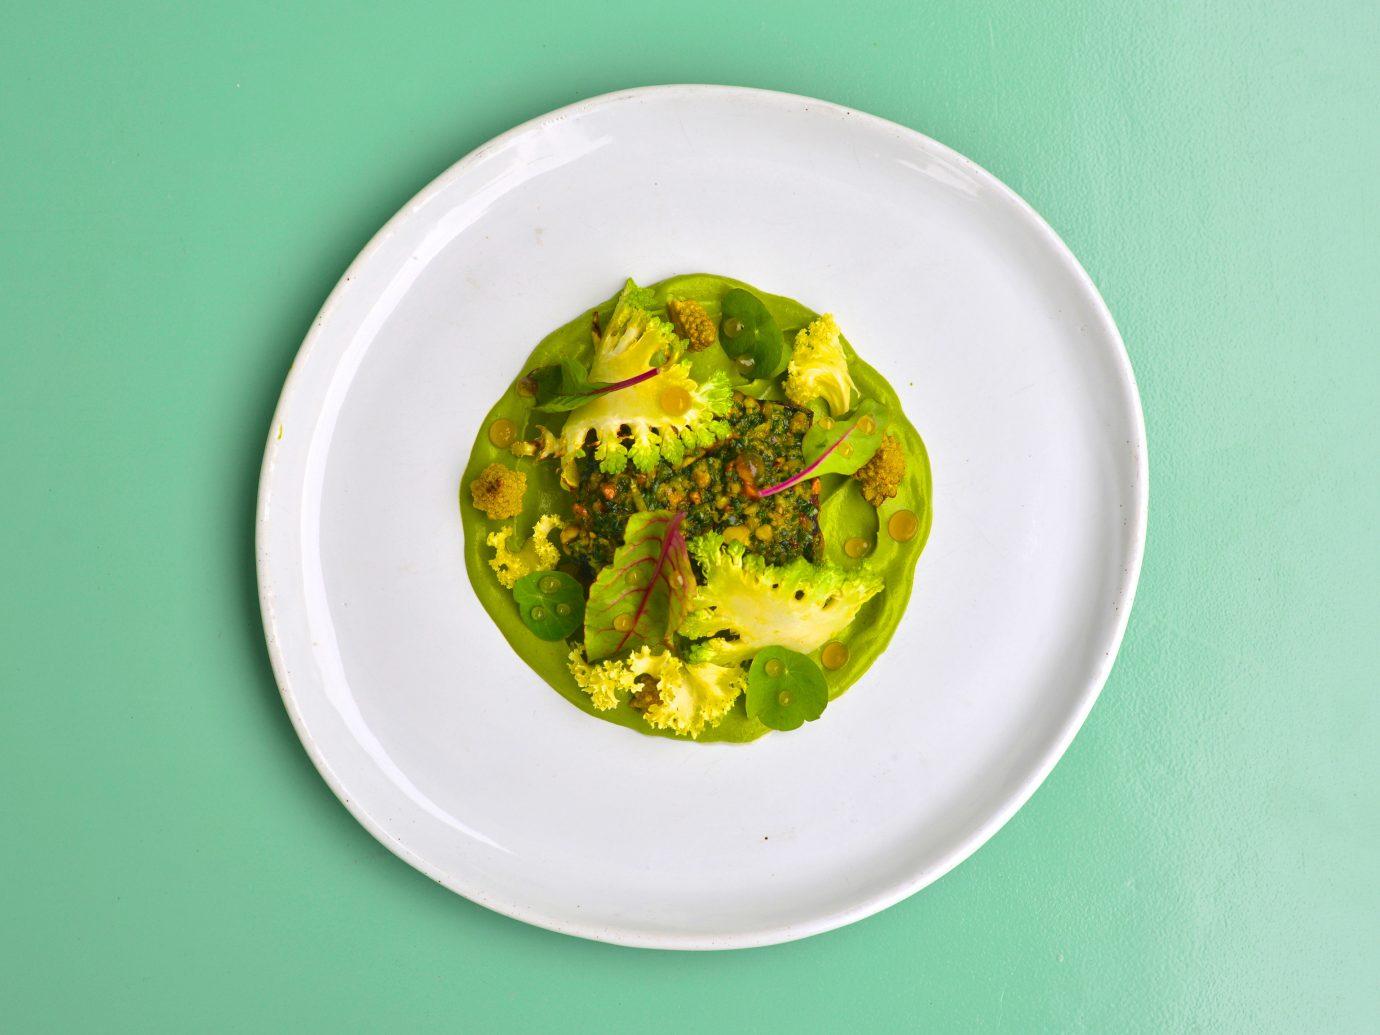 Food + Drink green plate food produce plant land plant leaf fruit sauce vegetable flowering plant